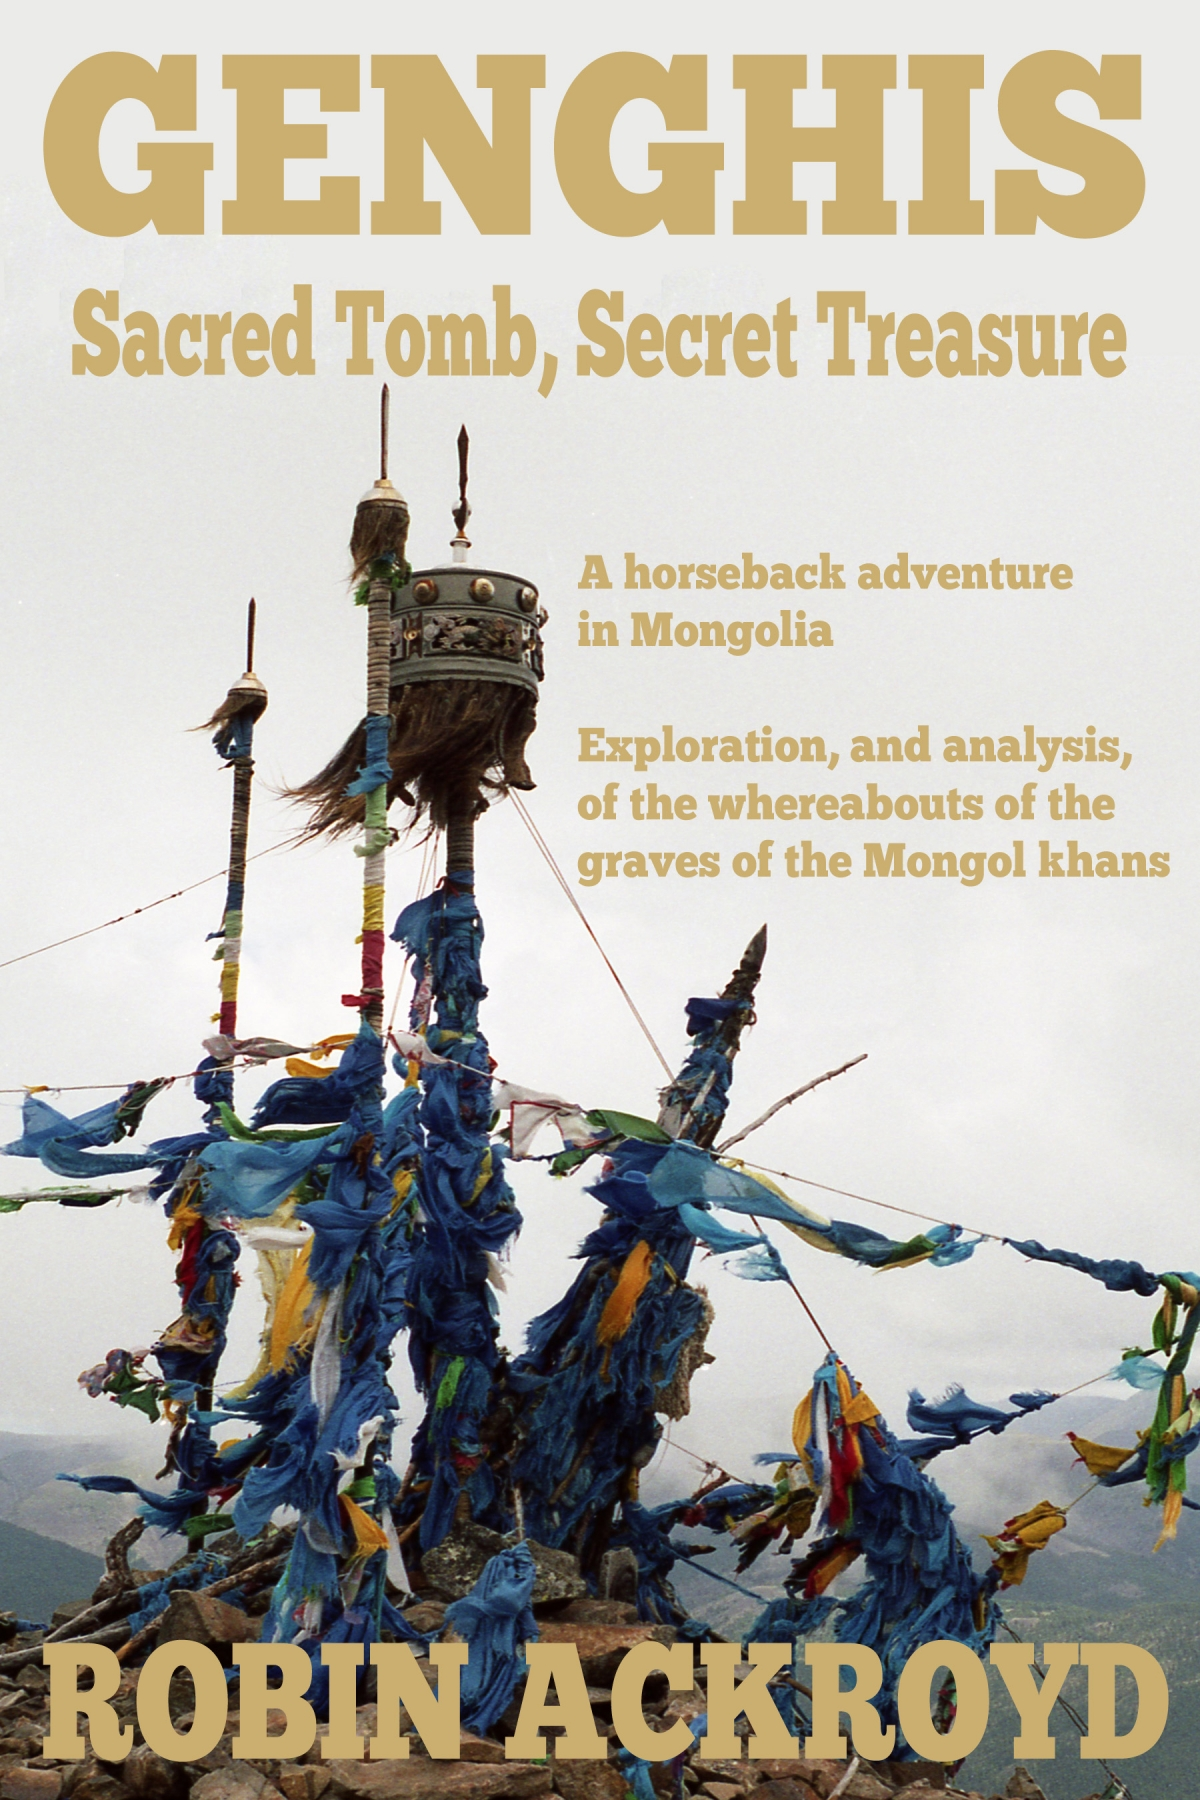 Genghis: Sacred Tomb, Secret Treasure